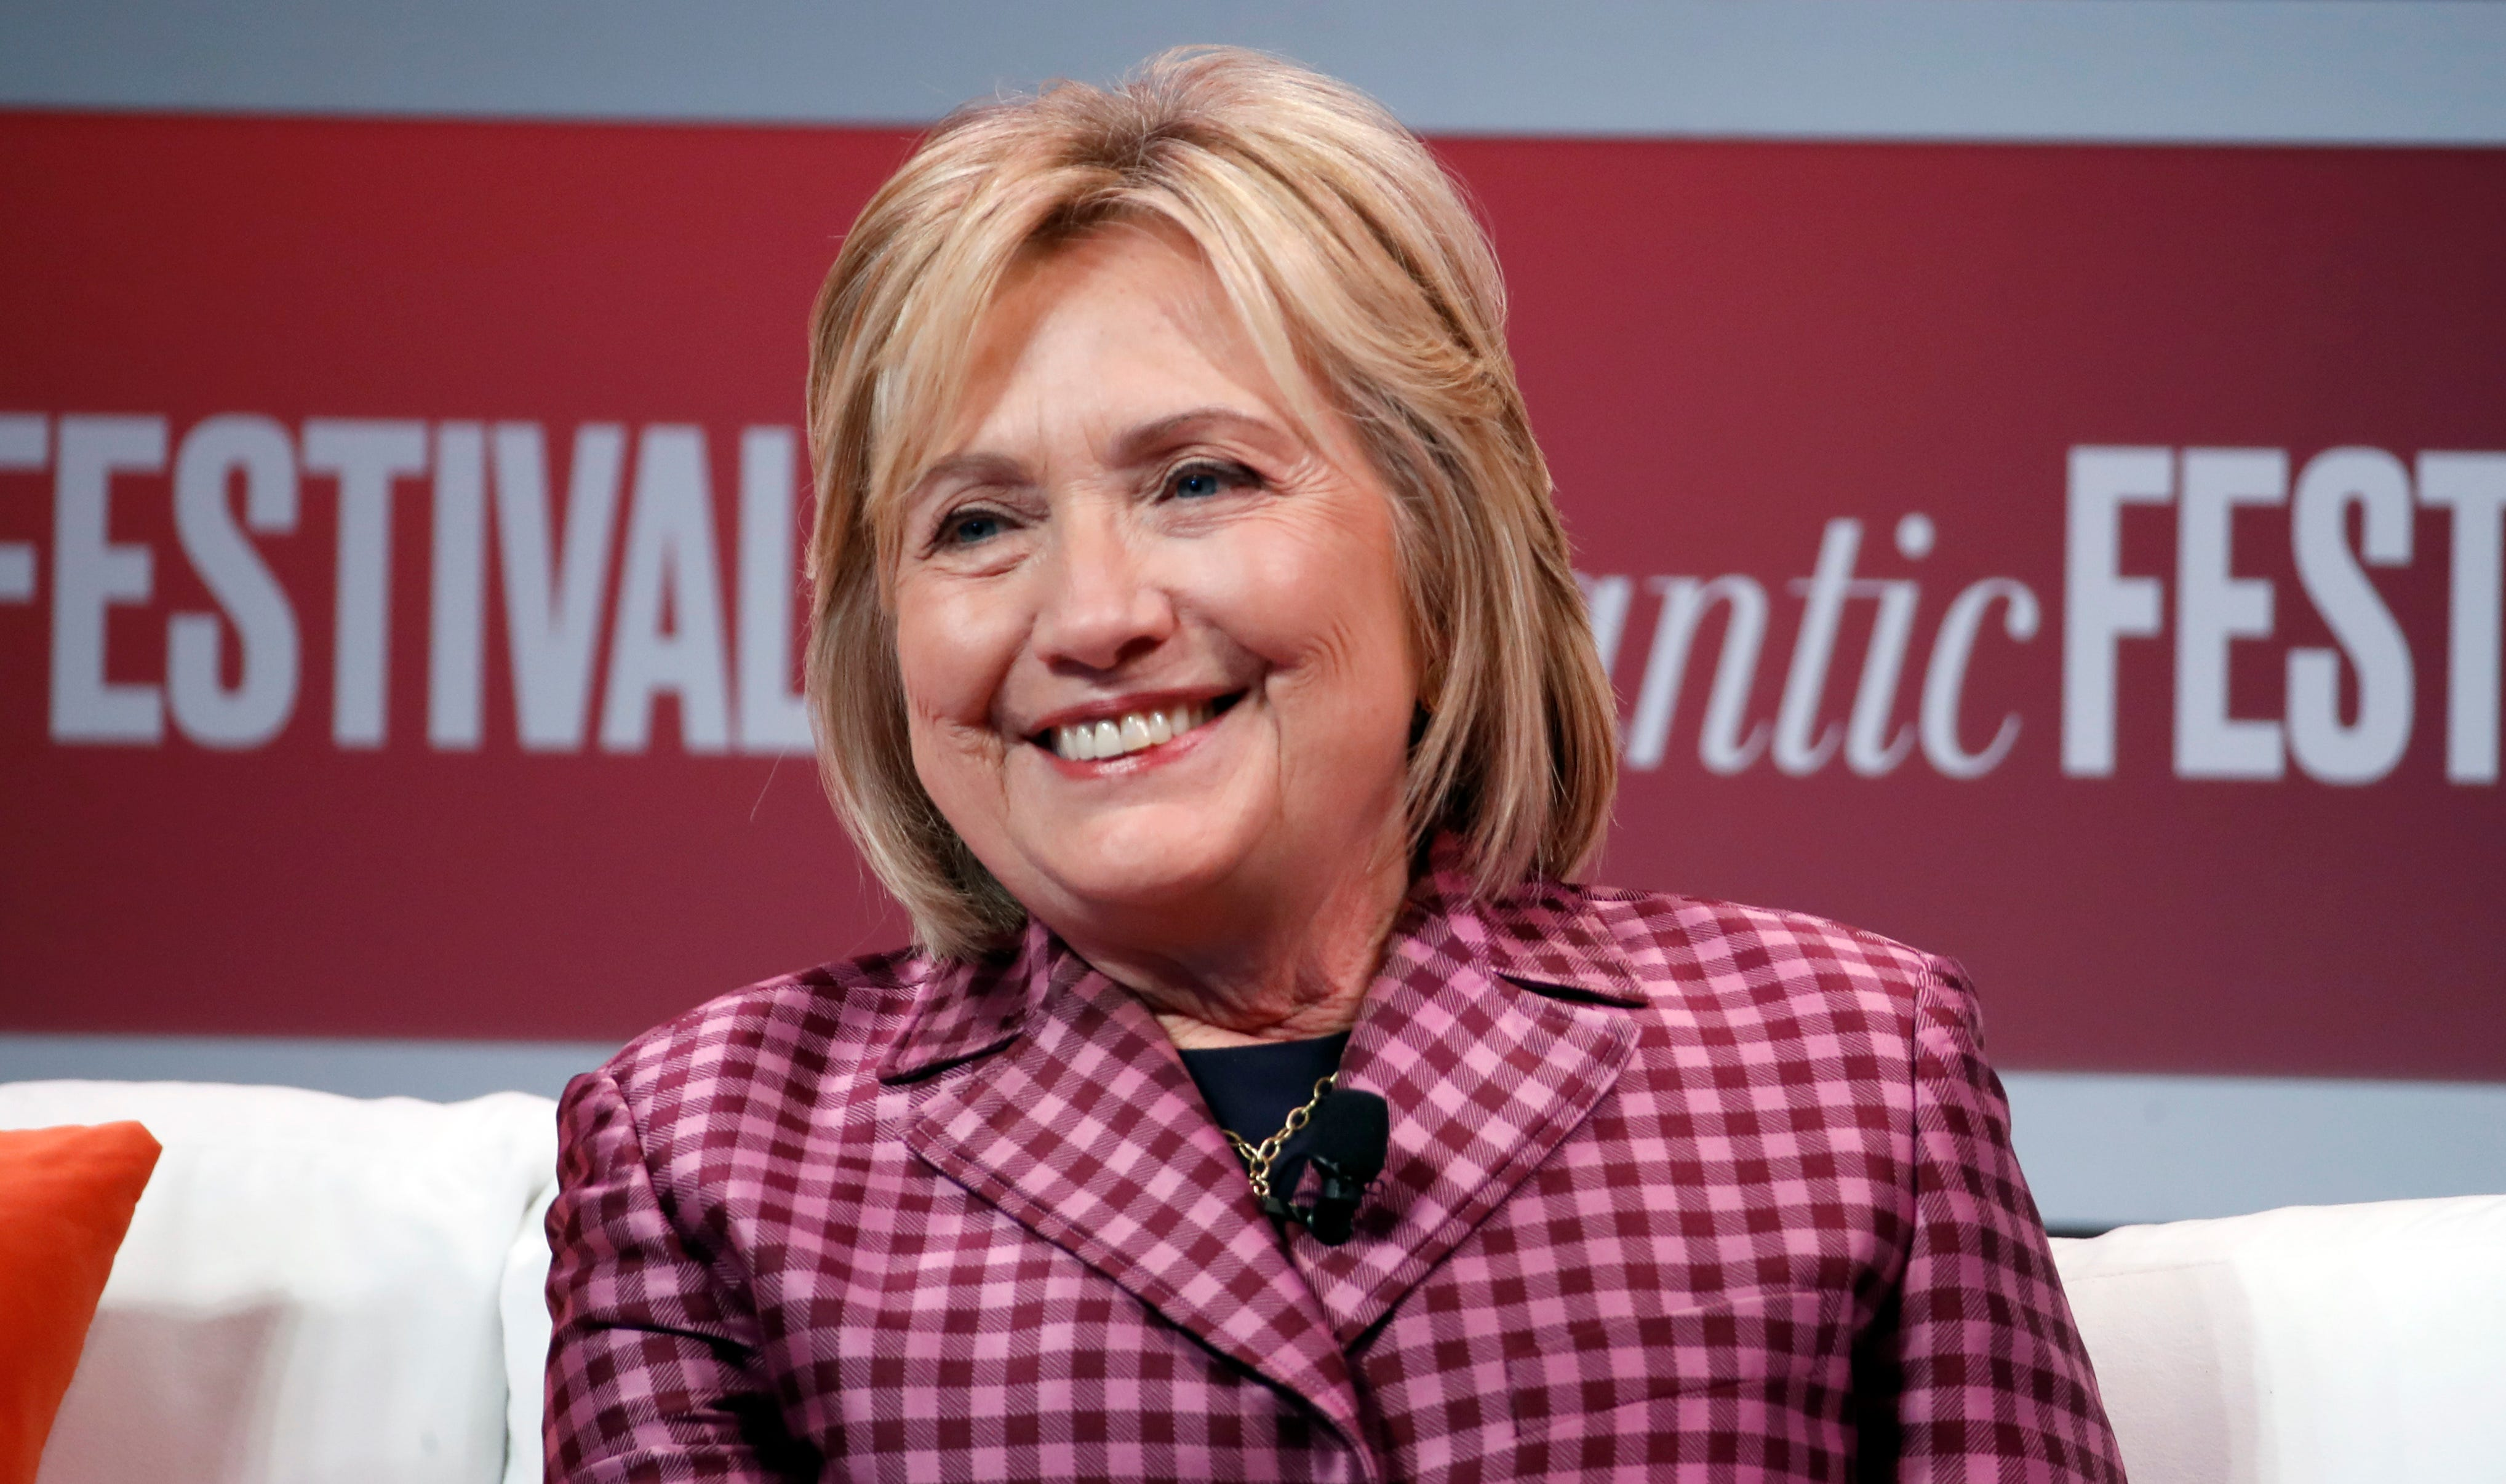 Hillary Clinton denies Bill's affair with Monica Lewinsky was an 'abuse of power'